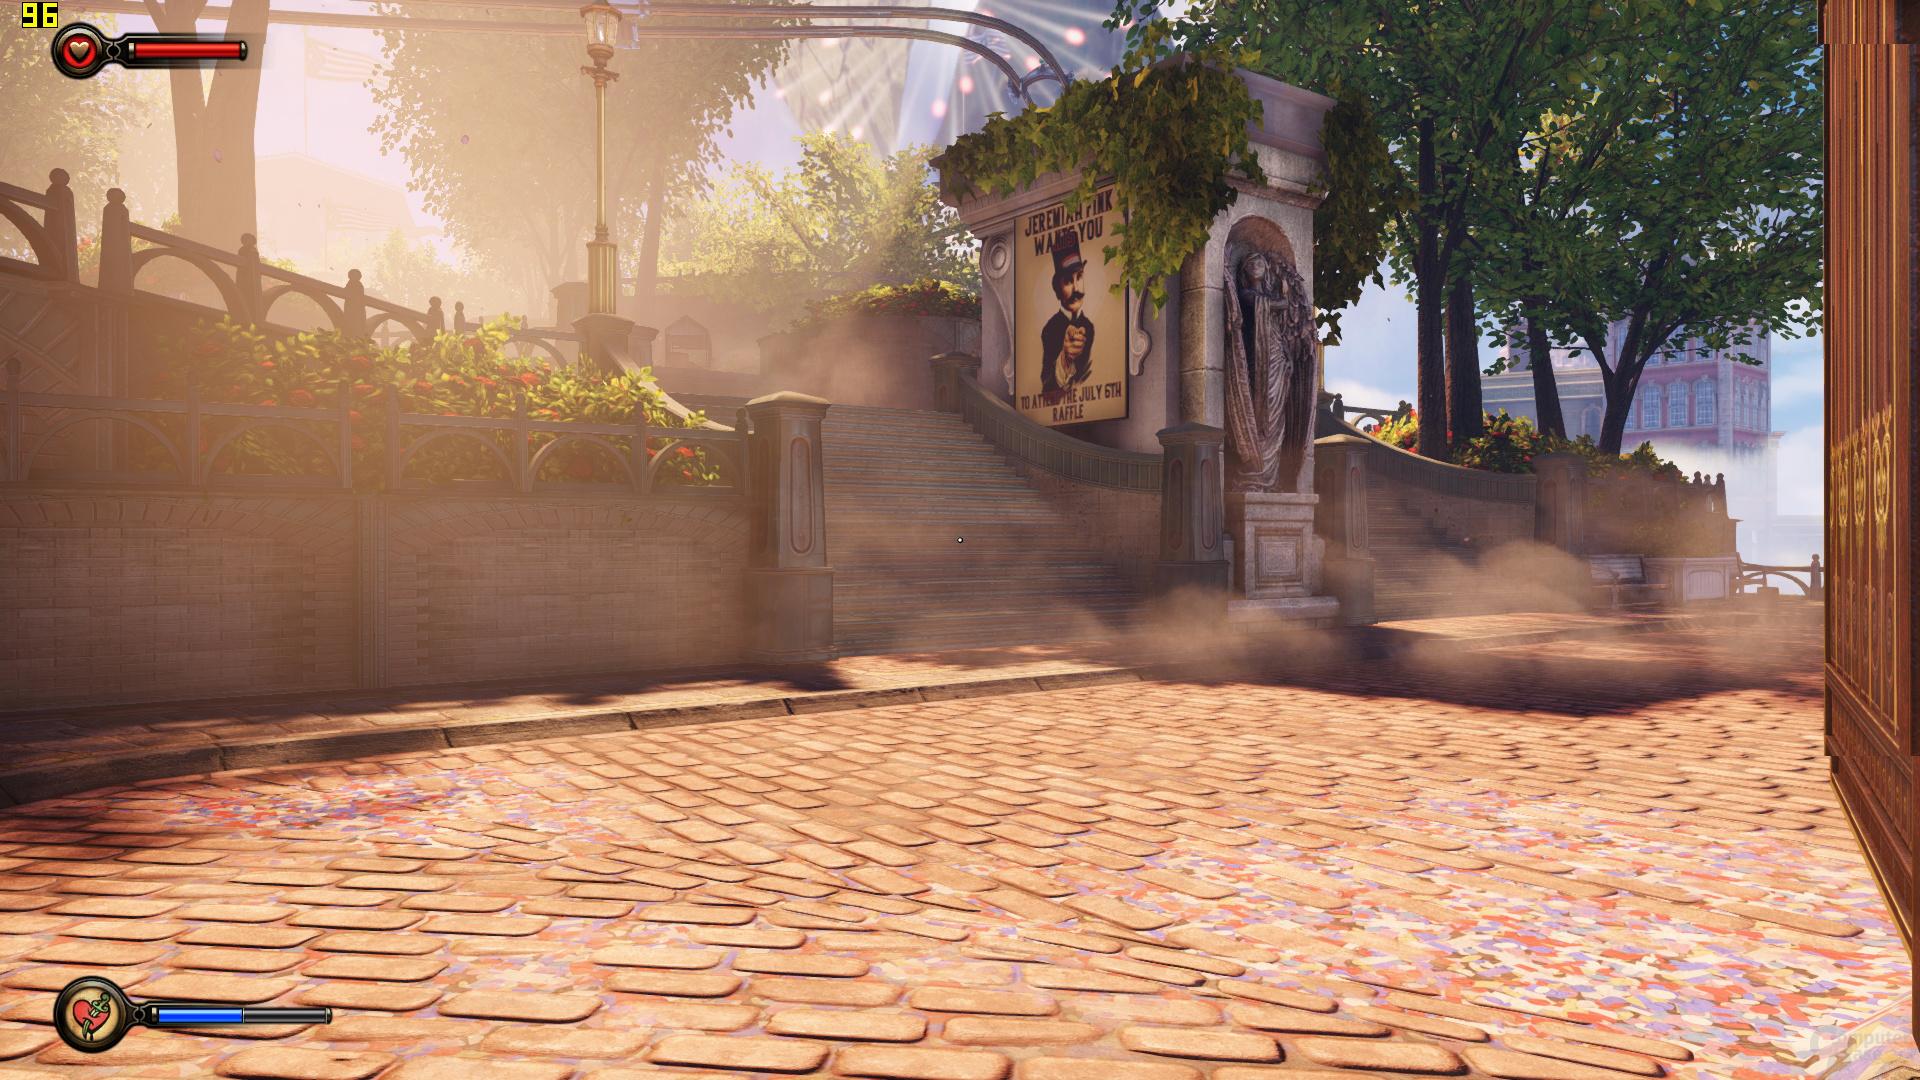 BioShock Infinite - Full HD